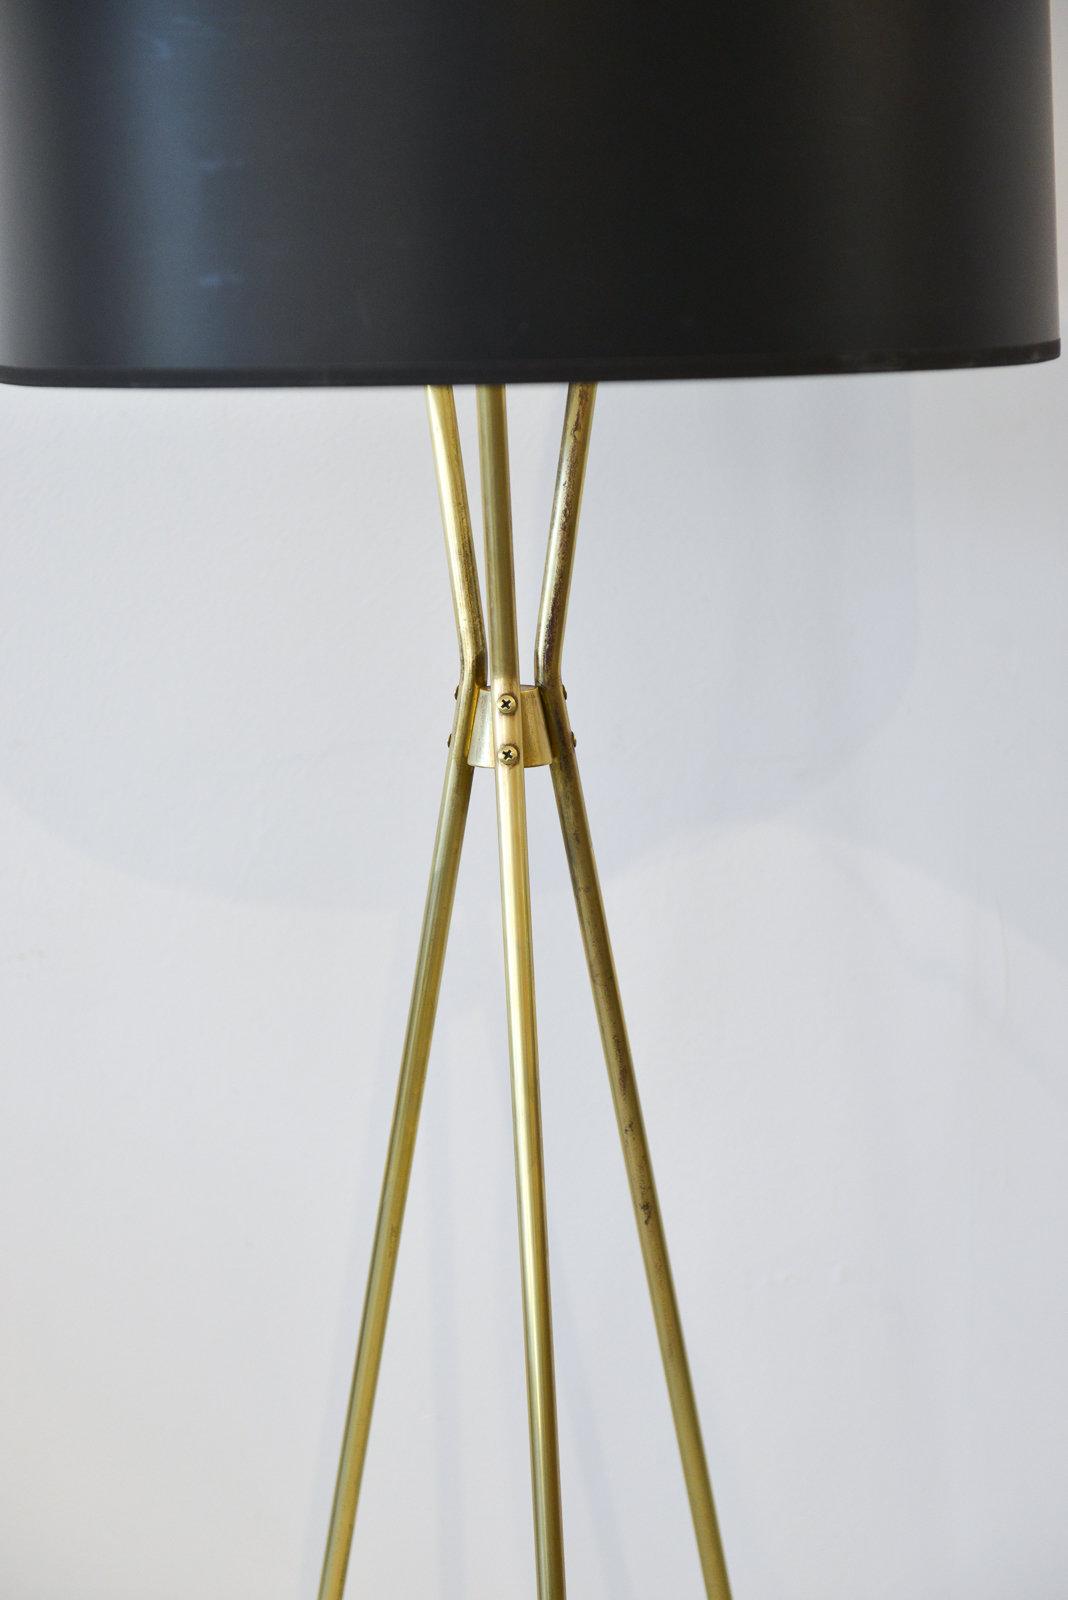 Gerald Thurston for Lightolier Brass Tripod Floor Lamp, circa 1965